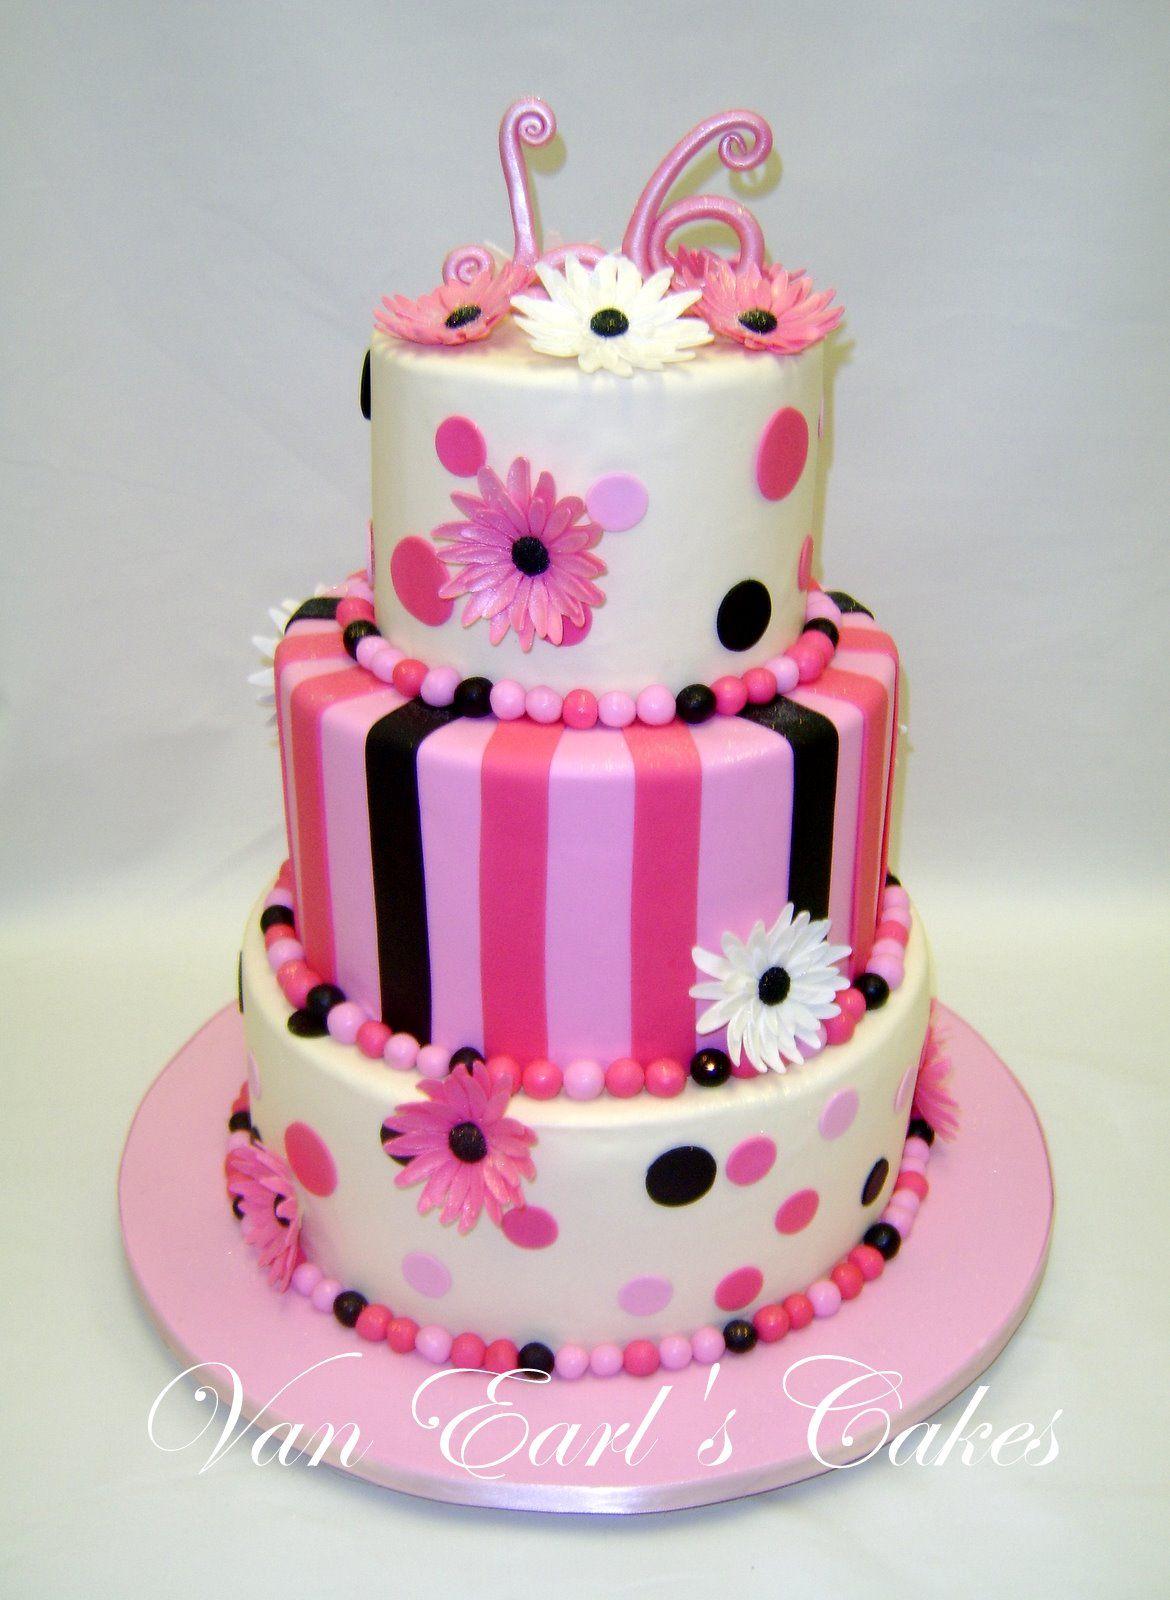 Sweet Sixteen Birthday Cakes Van Earls Cakes Sweet 16 Birthday